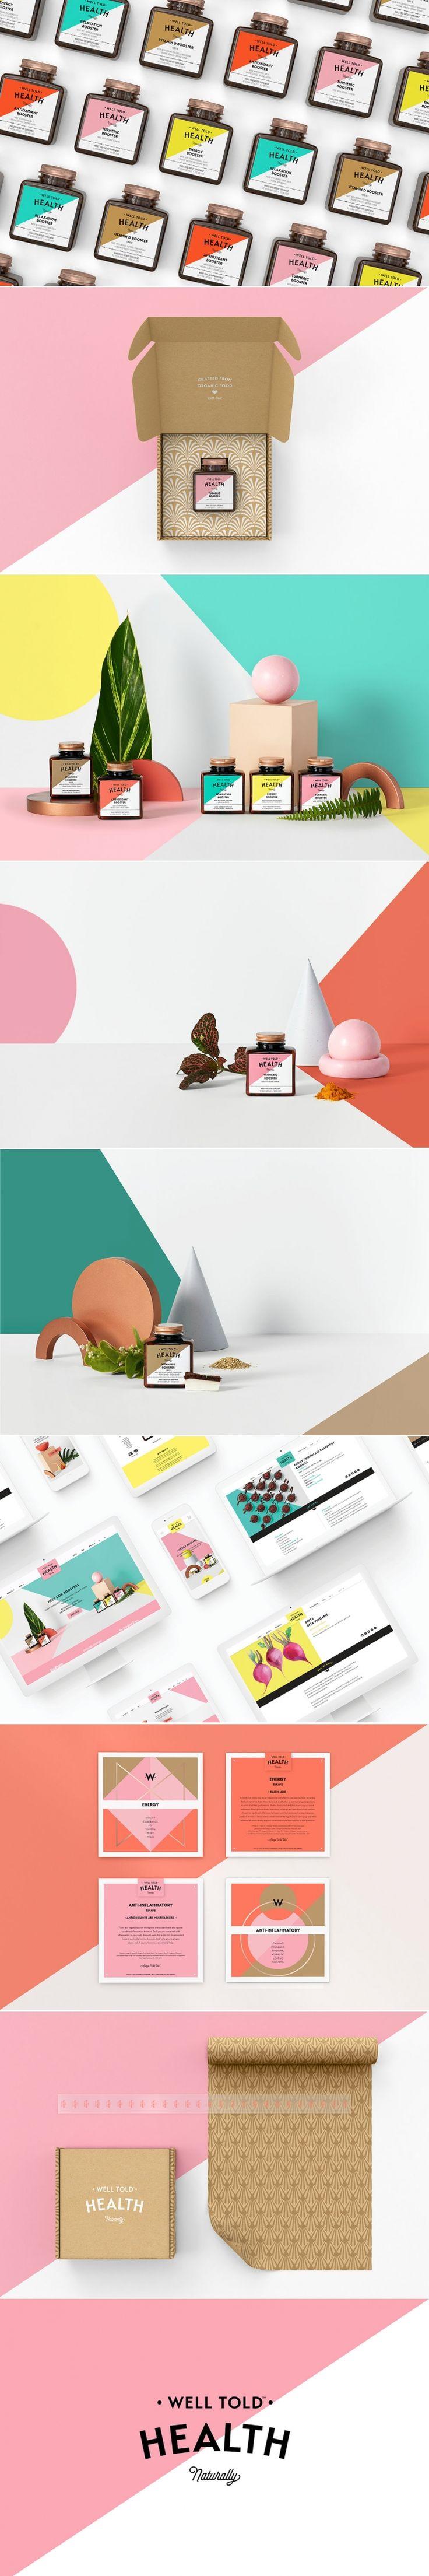 Best 25 Design agency ideas on Pinterest